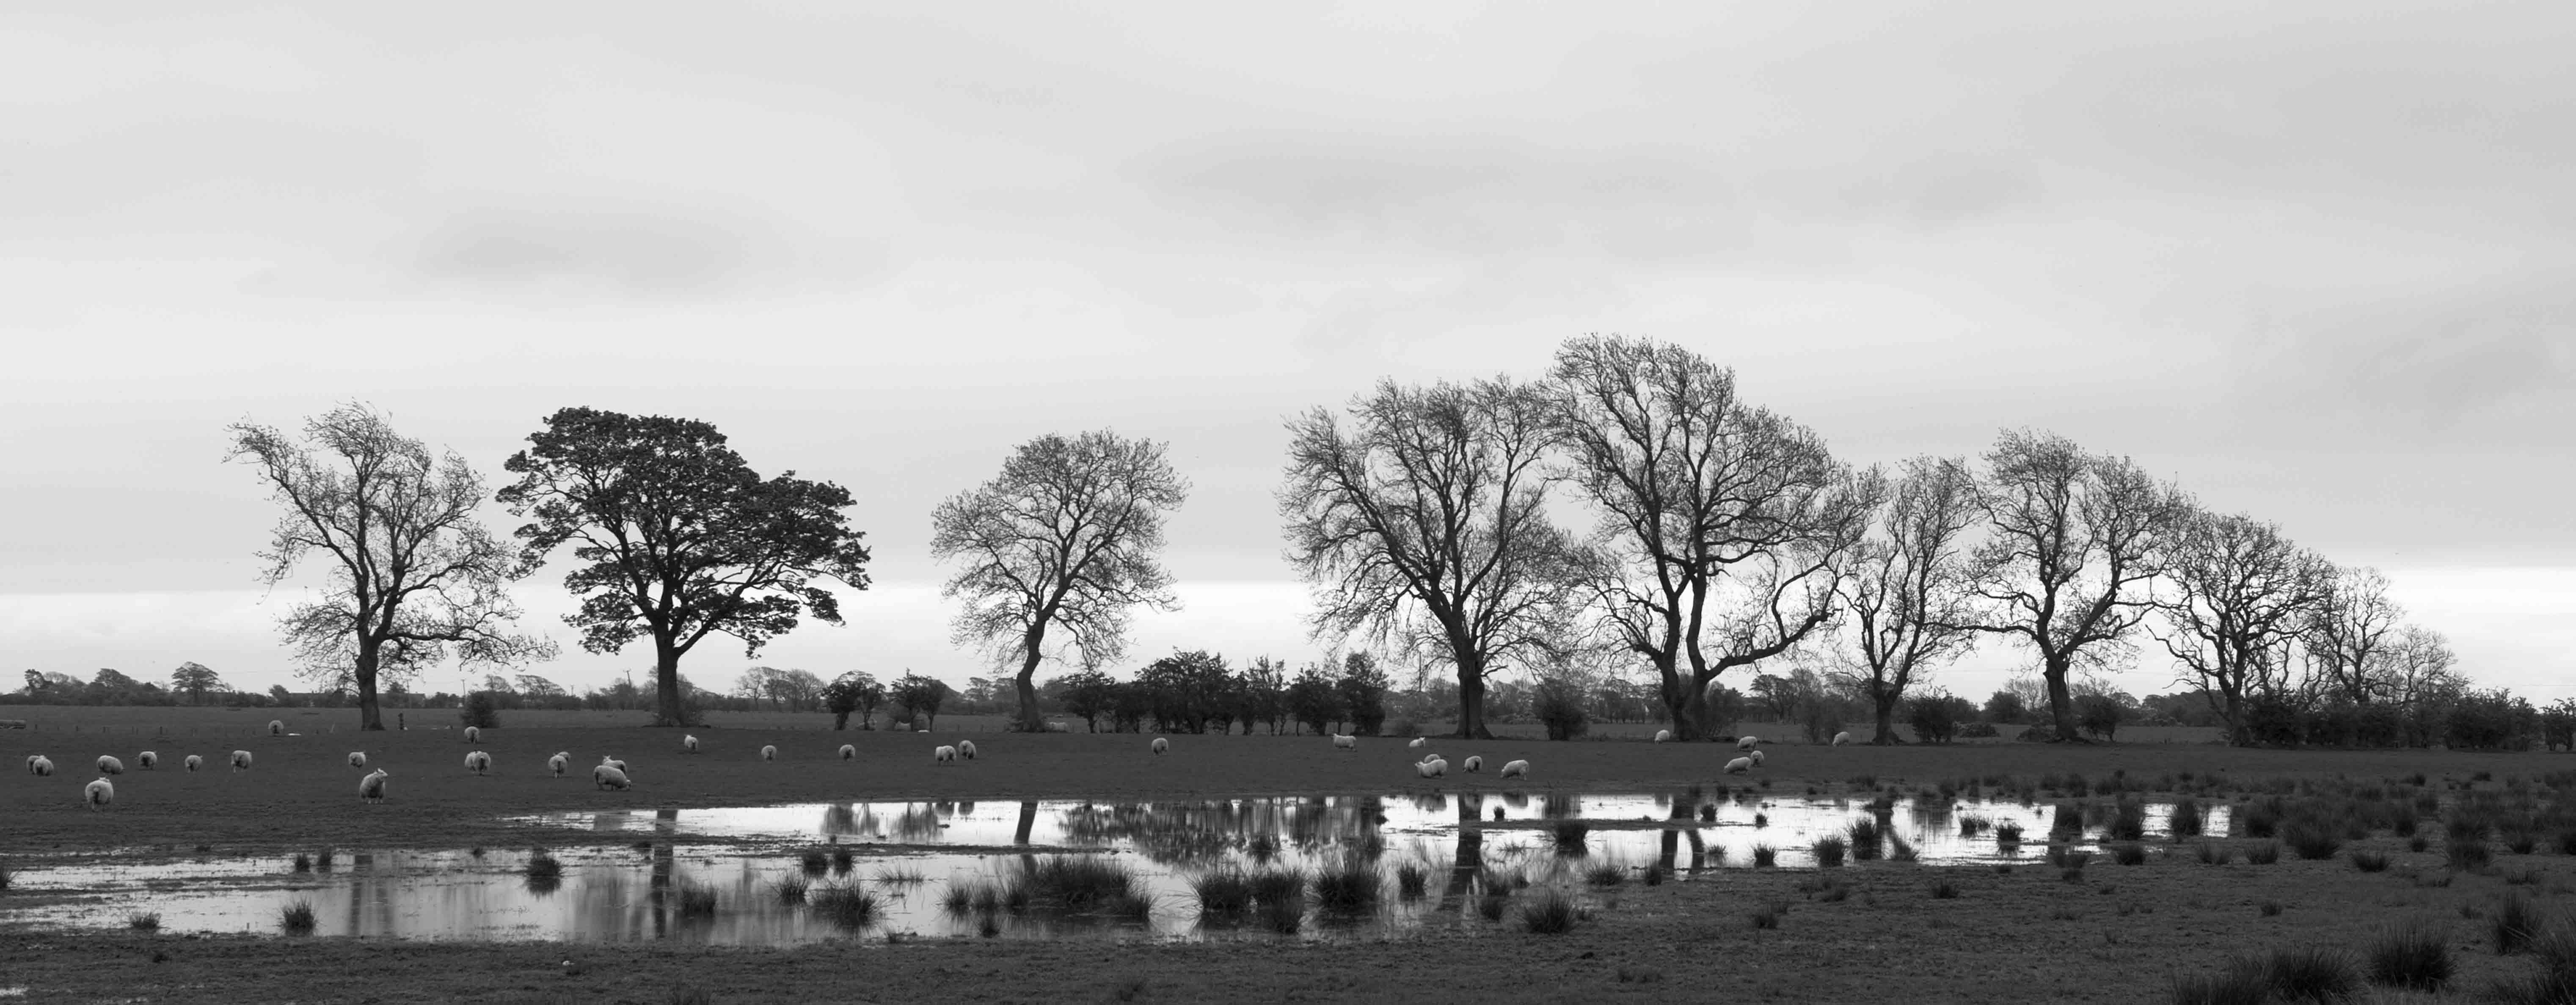 Bäume im Mai bei Caerlaeverock Castle ©Johannes Ratermann